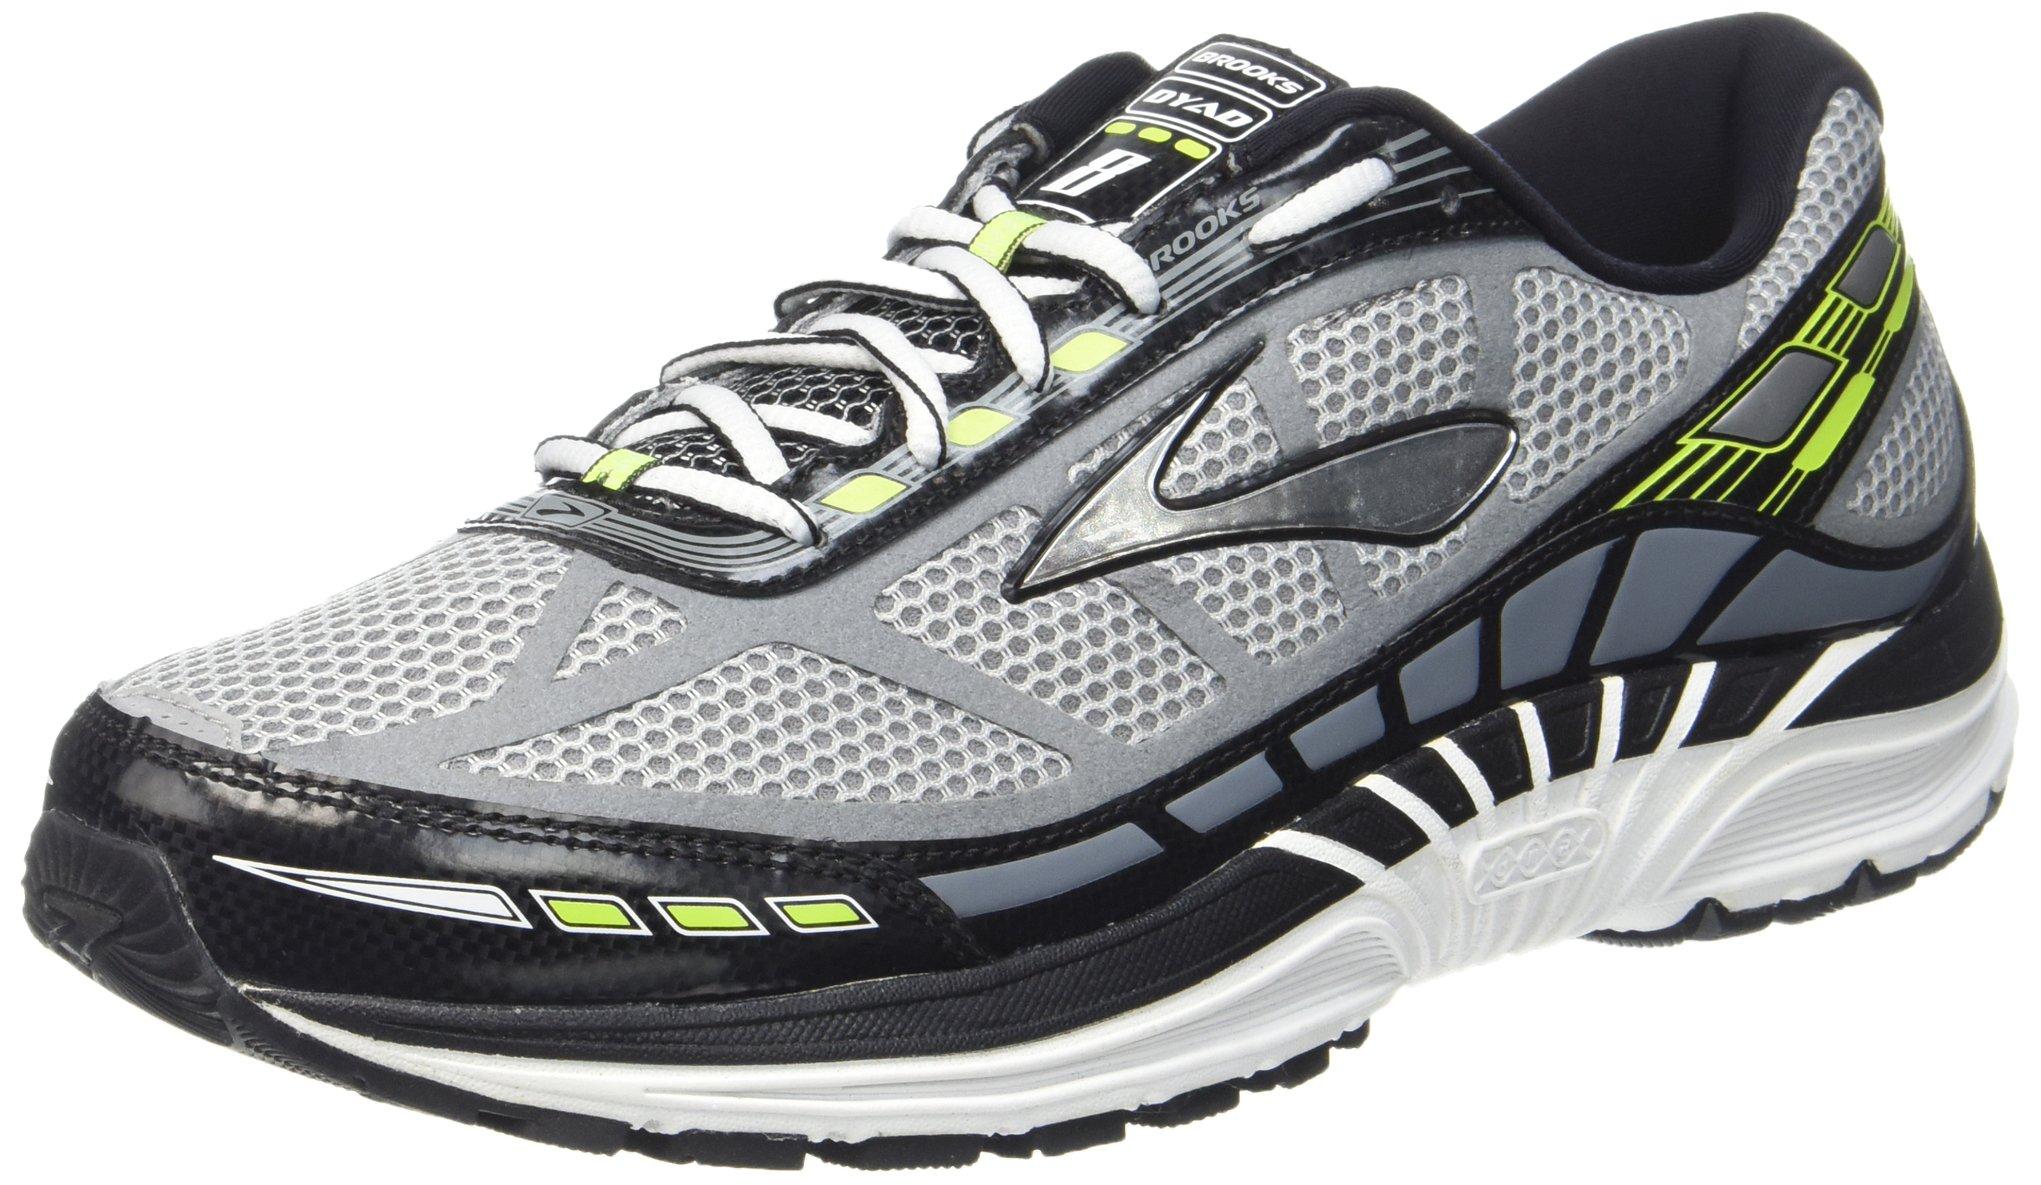 Brooks Men's Dyad 8 Running Shoes - Buy